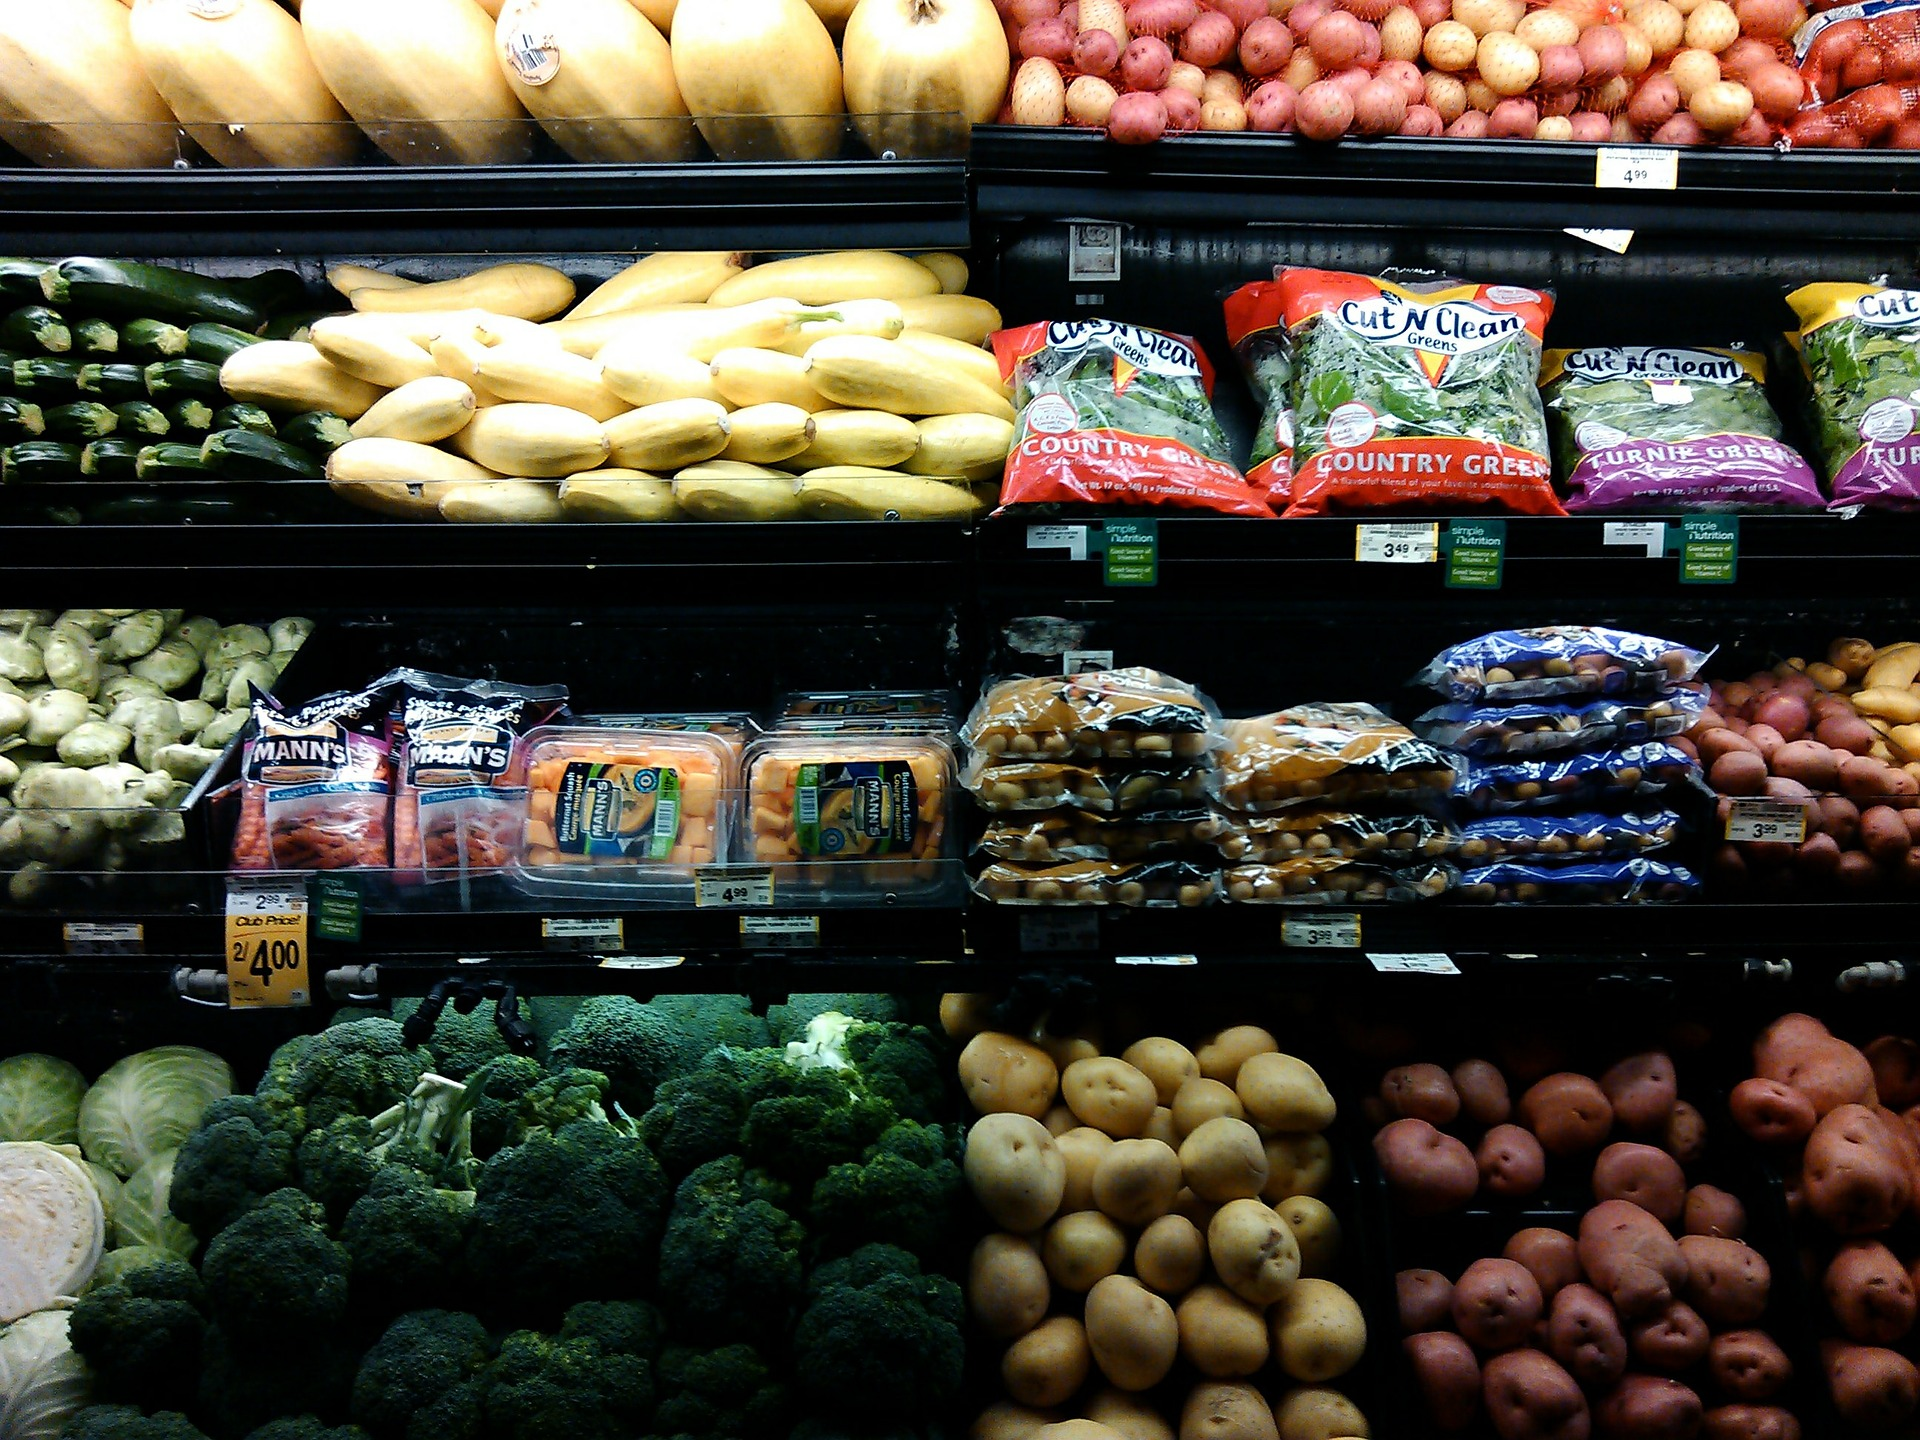 grocery-412912_1920.jpg